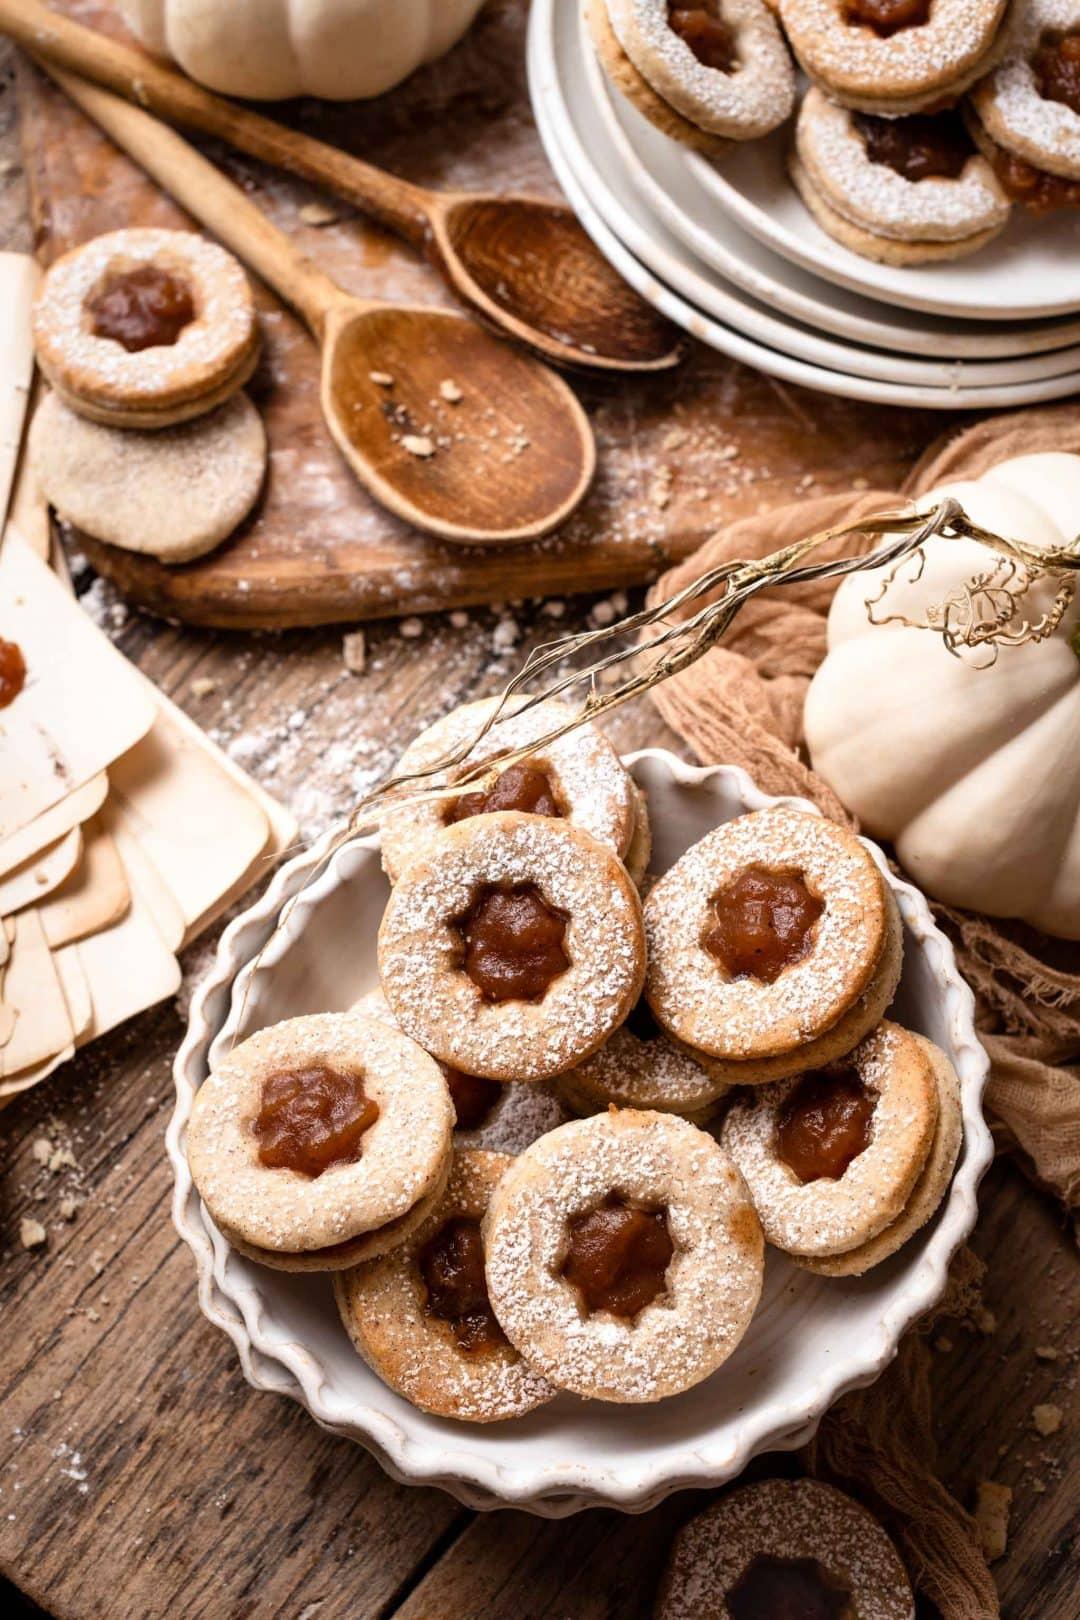 Recipe for Homemade Apple Butter Sandwich Cookies